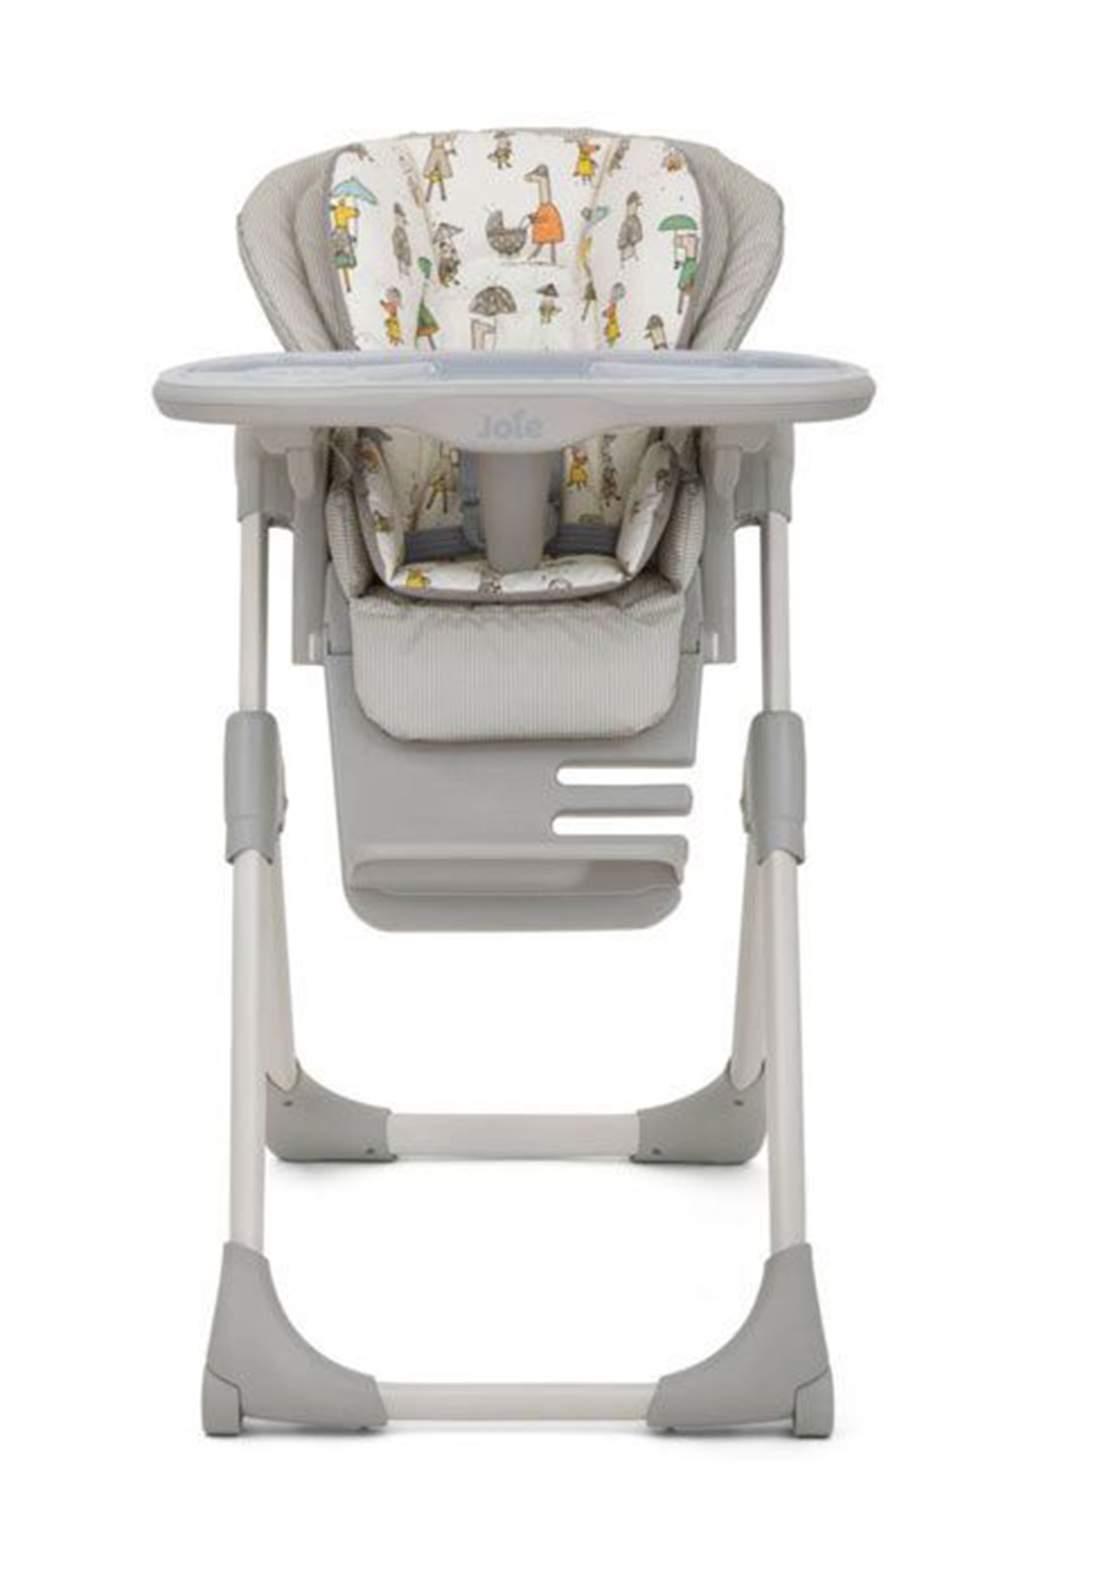 كرسي طعام للاطفالJoie Baby H1013CAITR000 Mimzy LX Highchair In the Rain